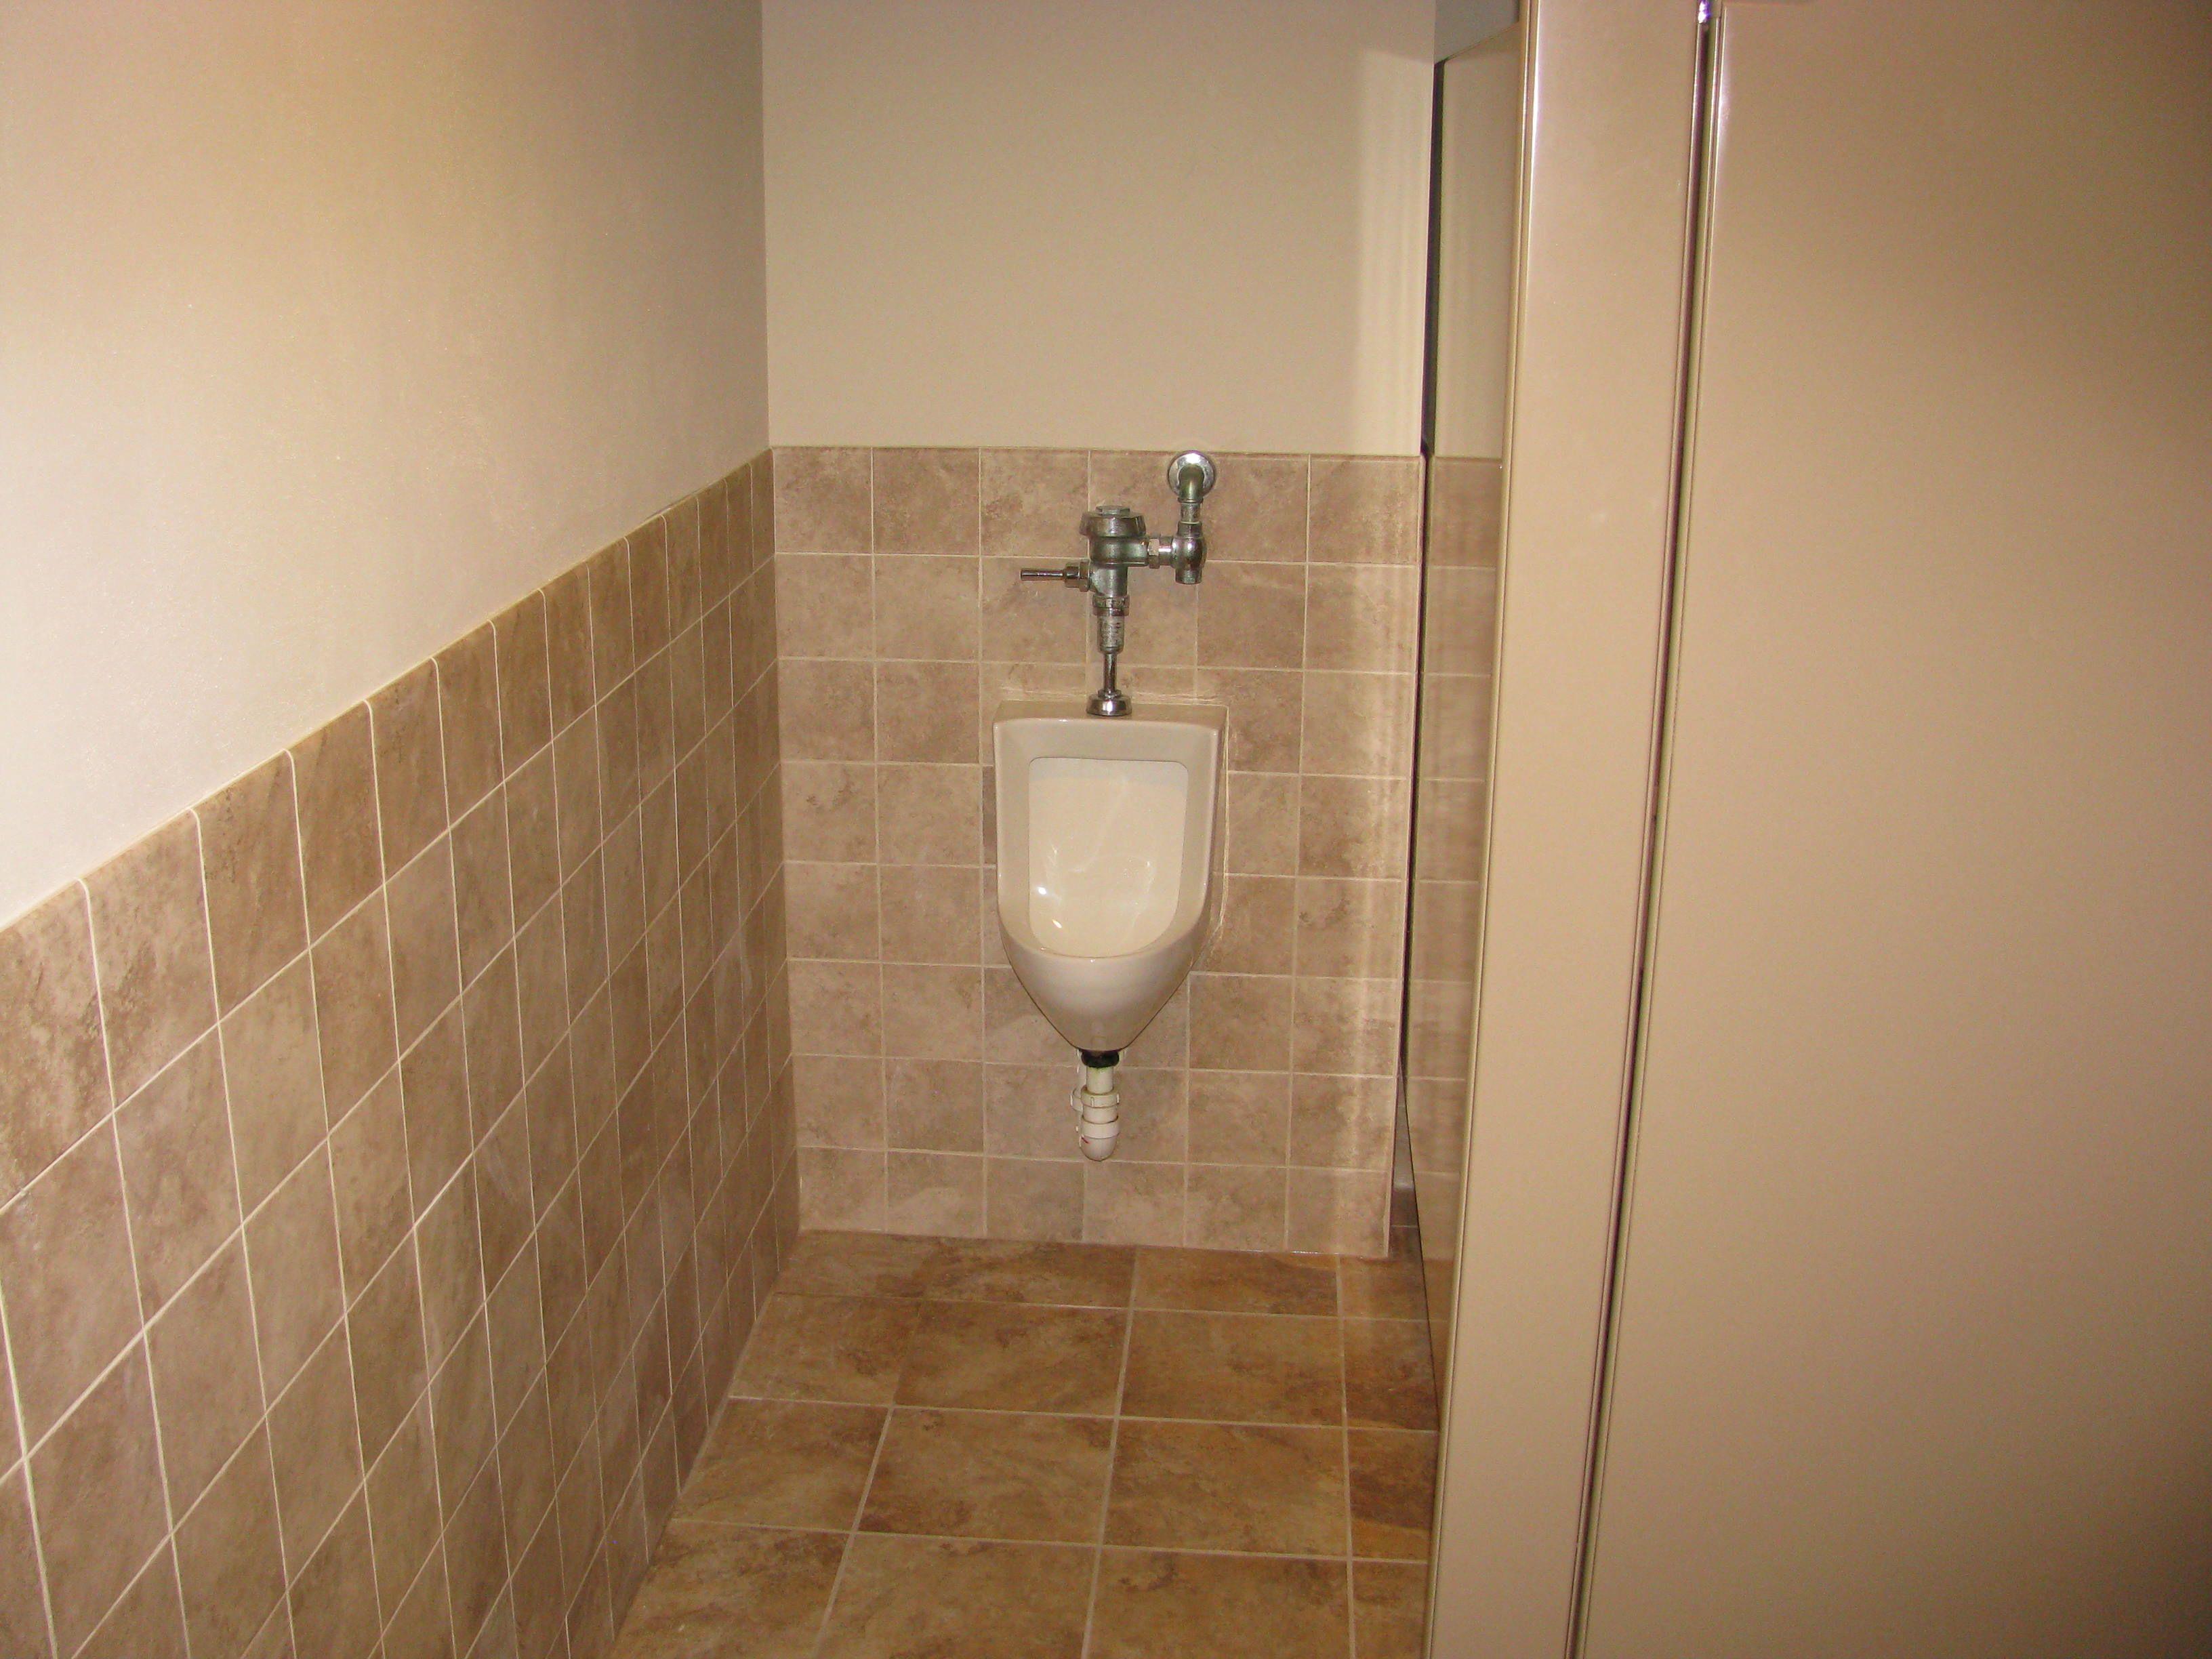 commercial bathroom design ideas | Commercial Bathrooms » Commercial on commercial bathroom counters, commercial bathroom showers, commercial bathroom sinks, commercial bathroom vanity tops, commercial bathroom partitions, commercial bathroom paper towel dispenser, commercial bathroom stalls, commercial bathroom vanity units,